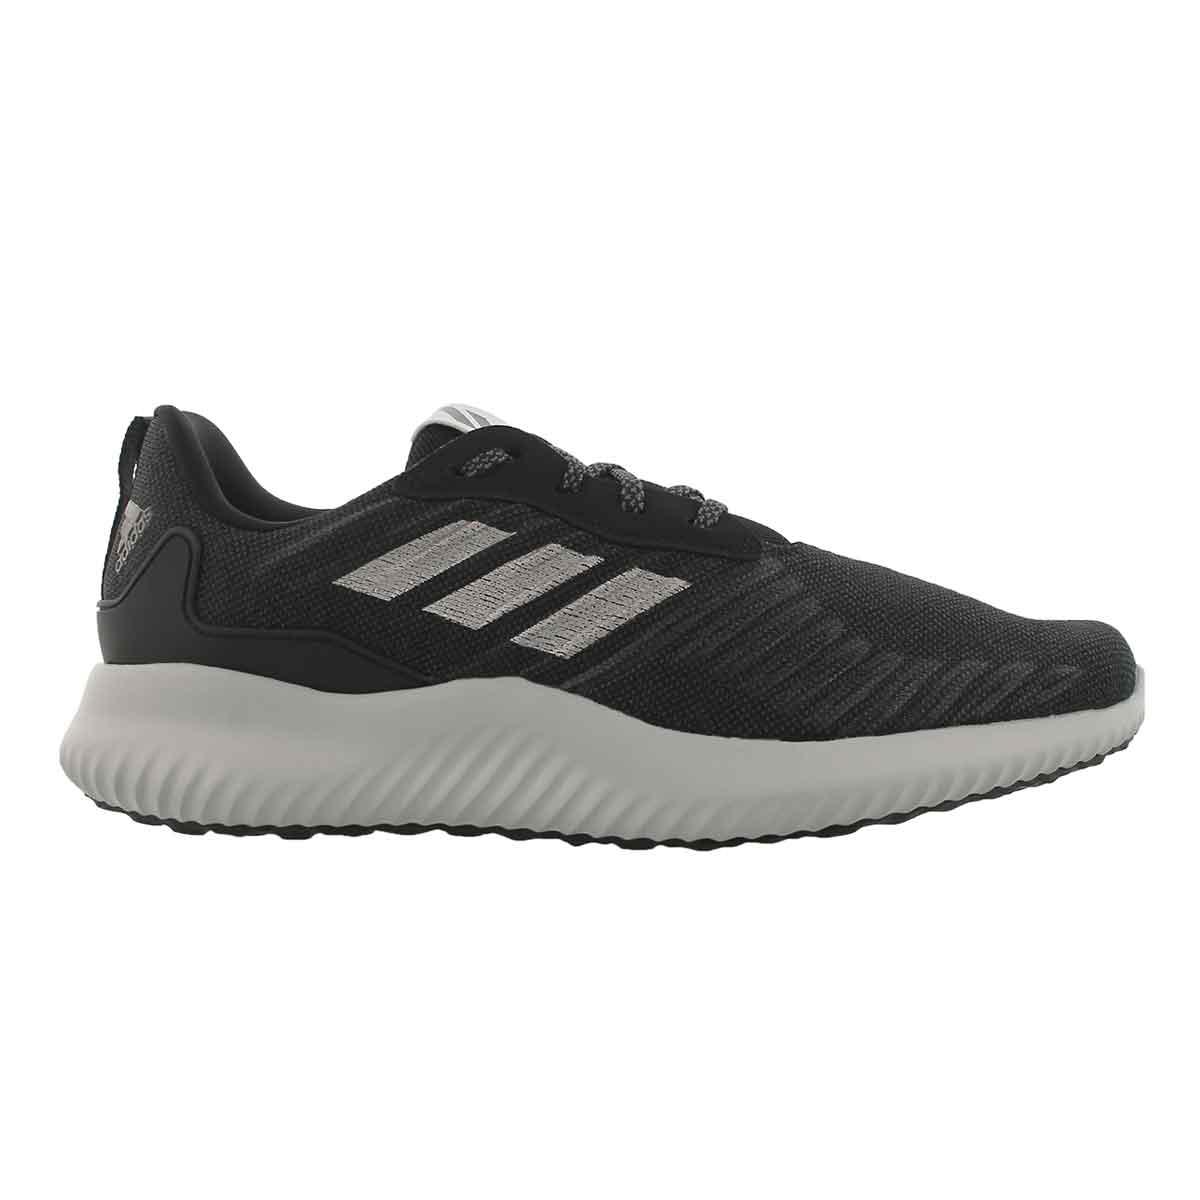 Mns Alphabounce RC blk/slvr running shoe